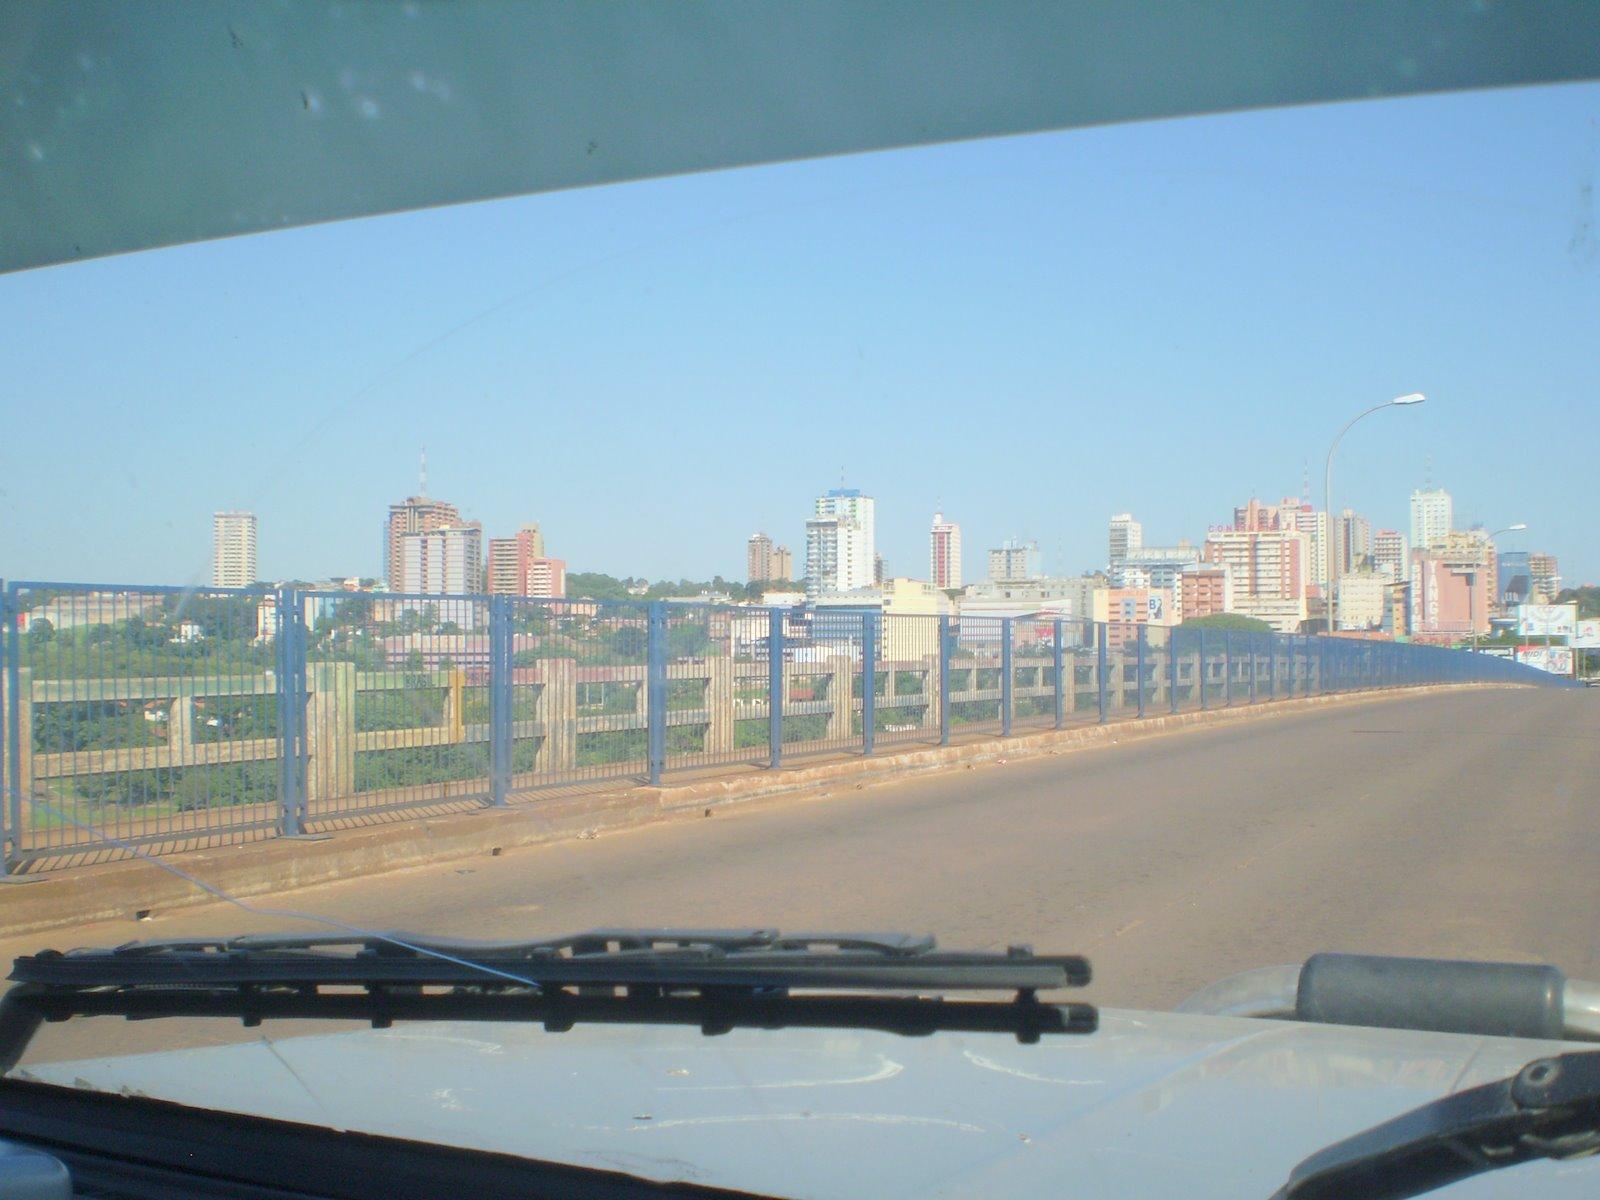 mein Leben in Paraguay: Immobilien-Paraguay-Mietkauf